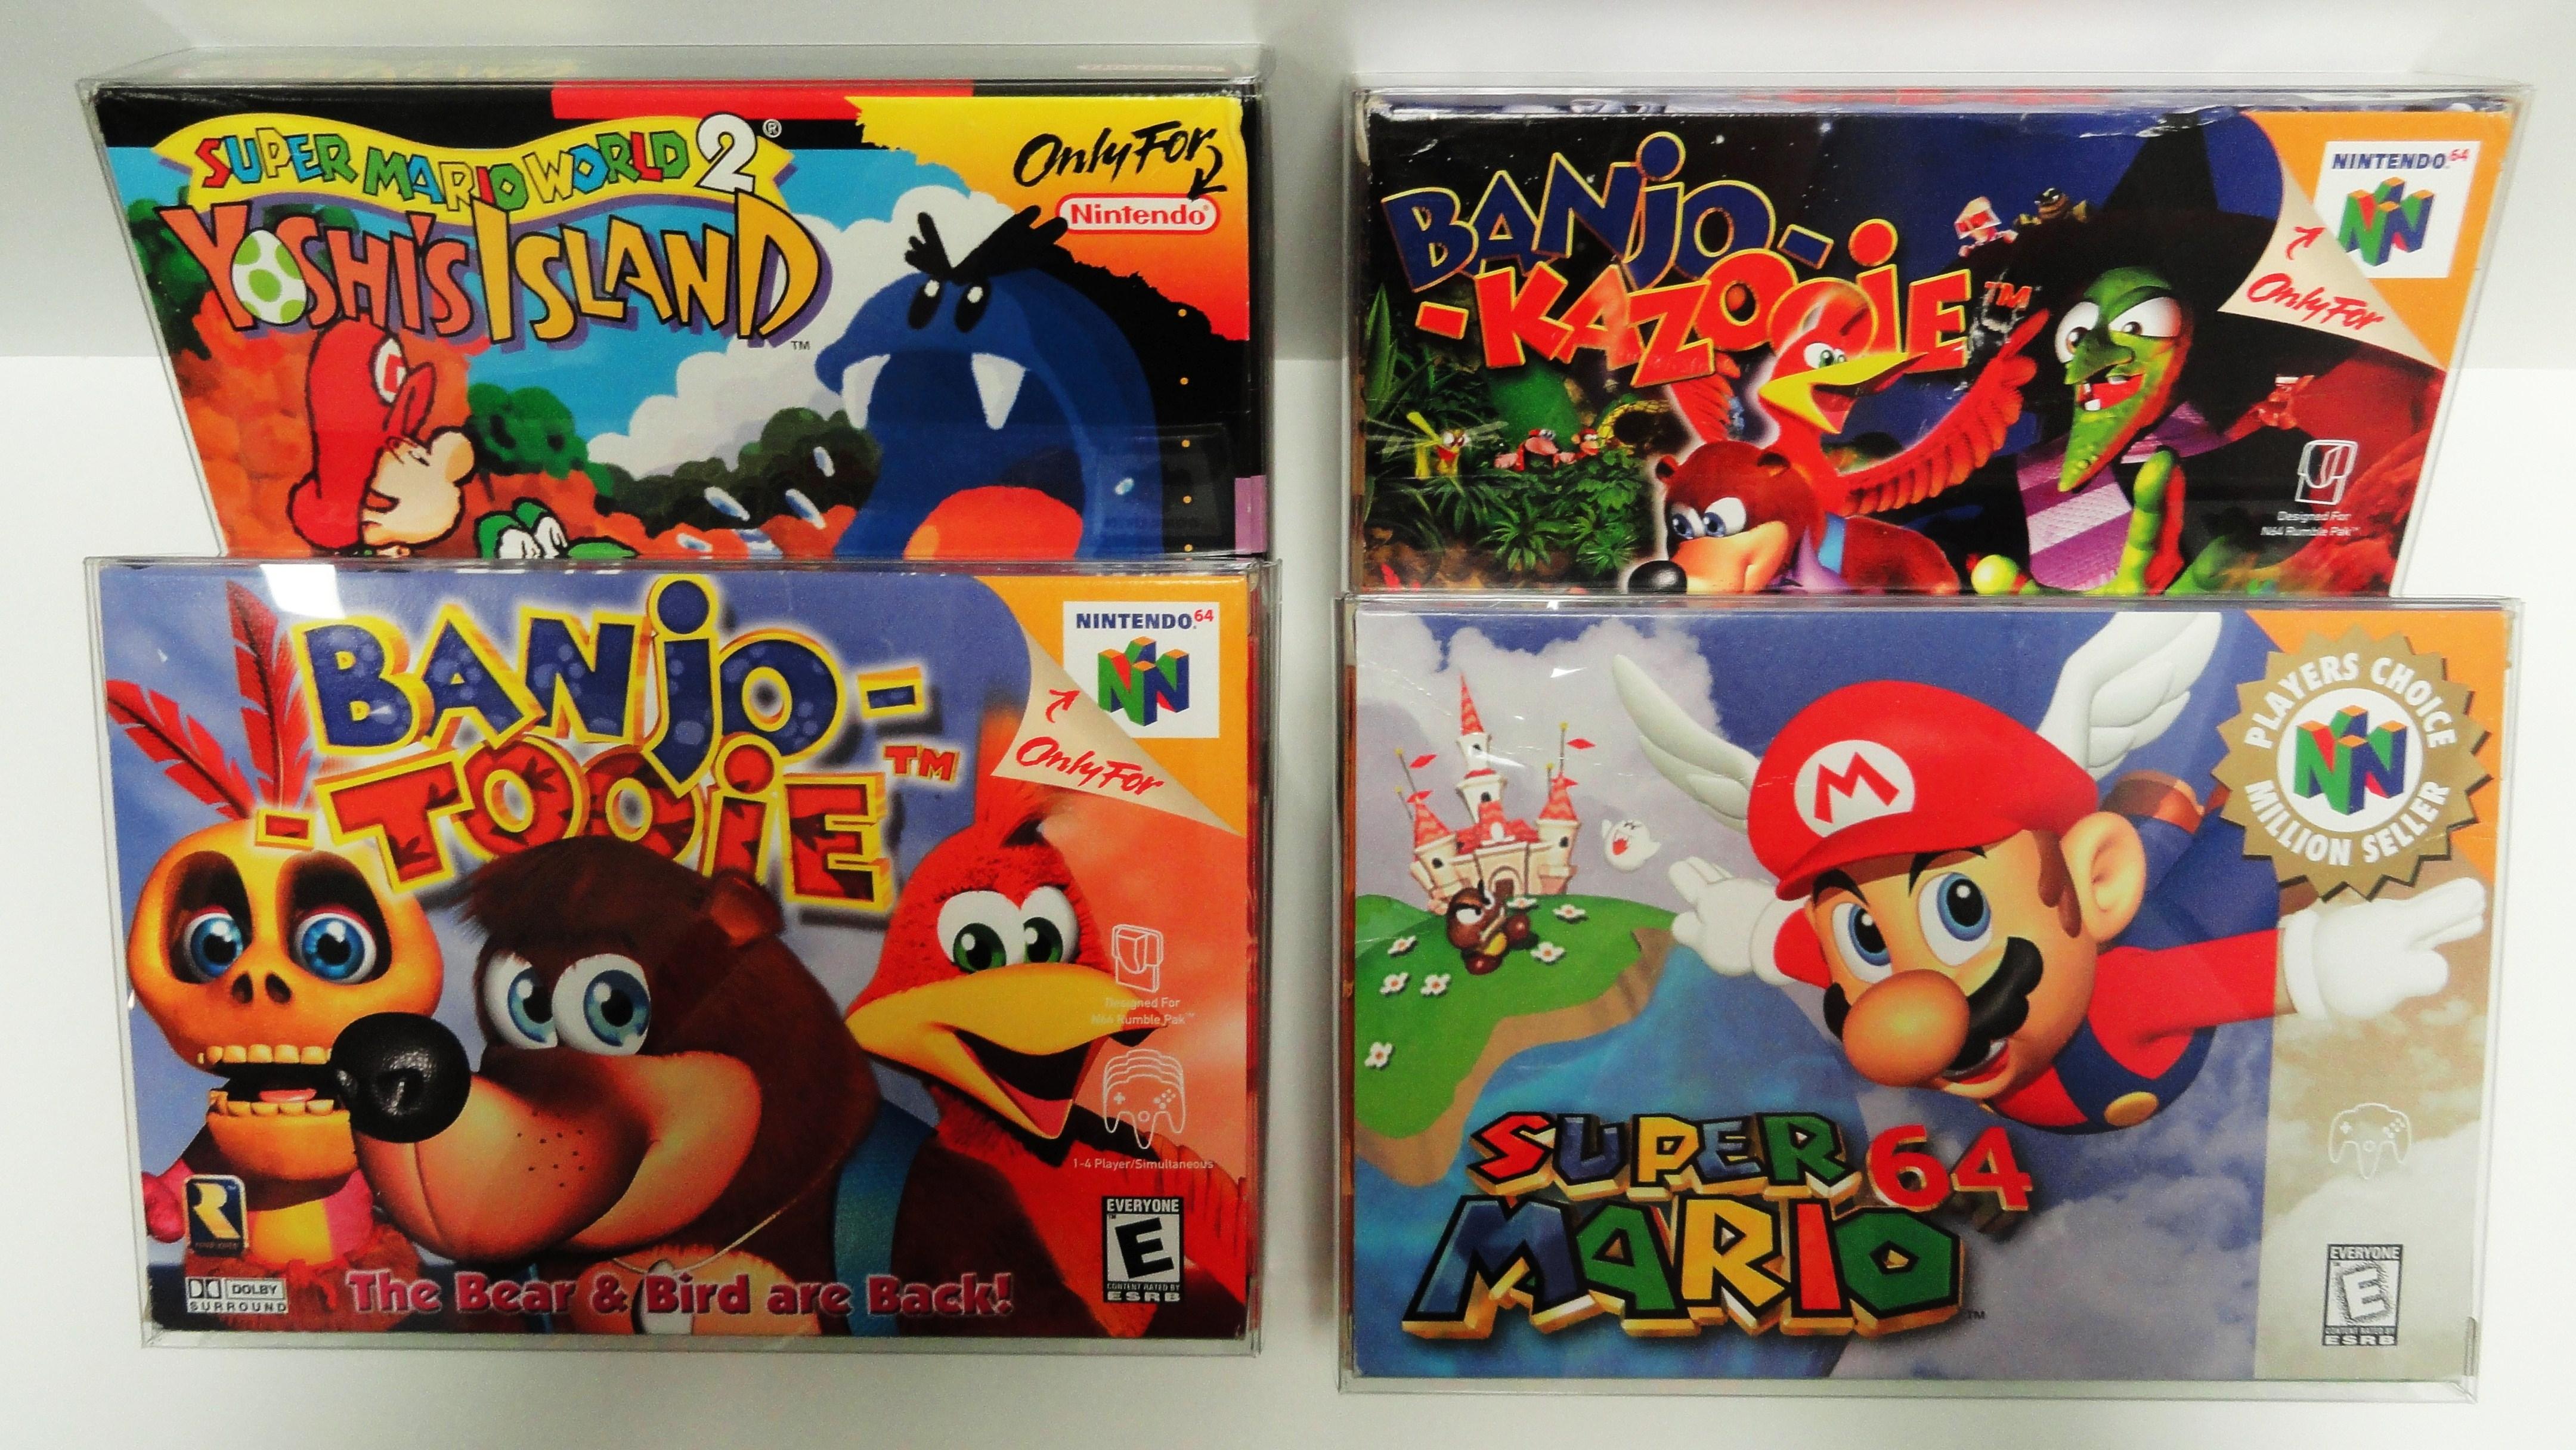 Nintendo 64 Boxes 010.jpg